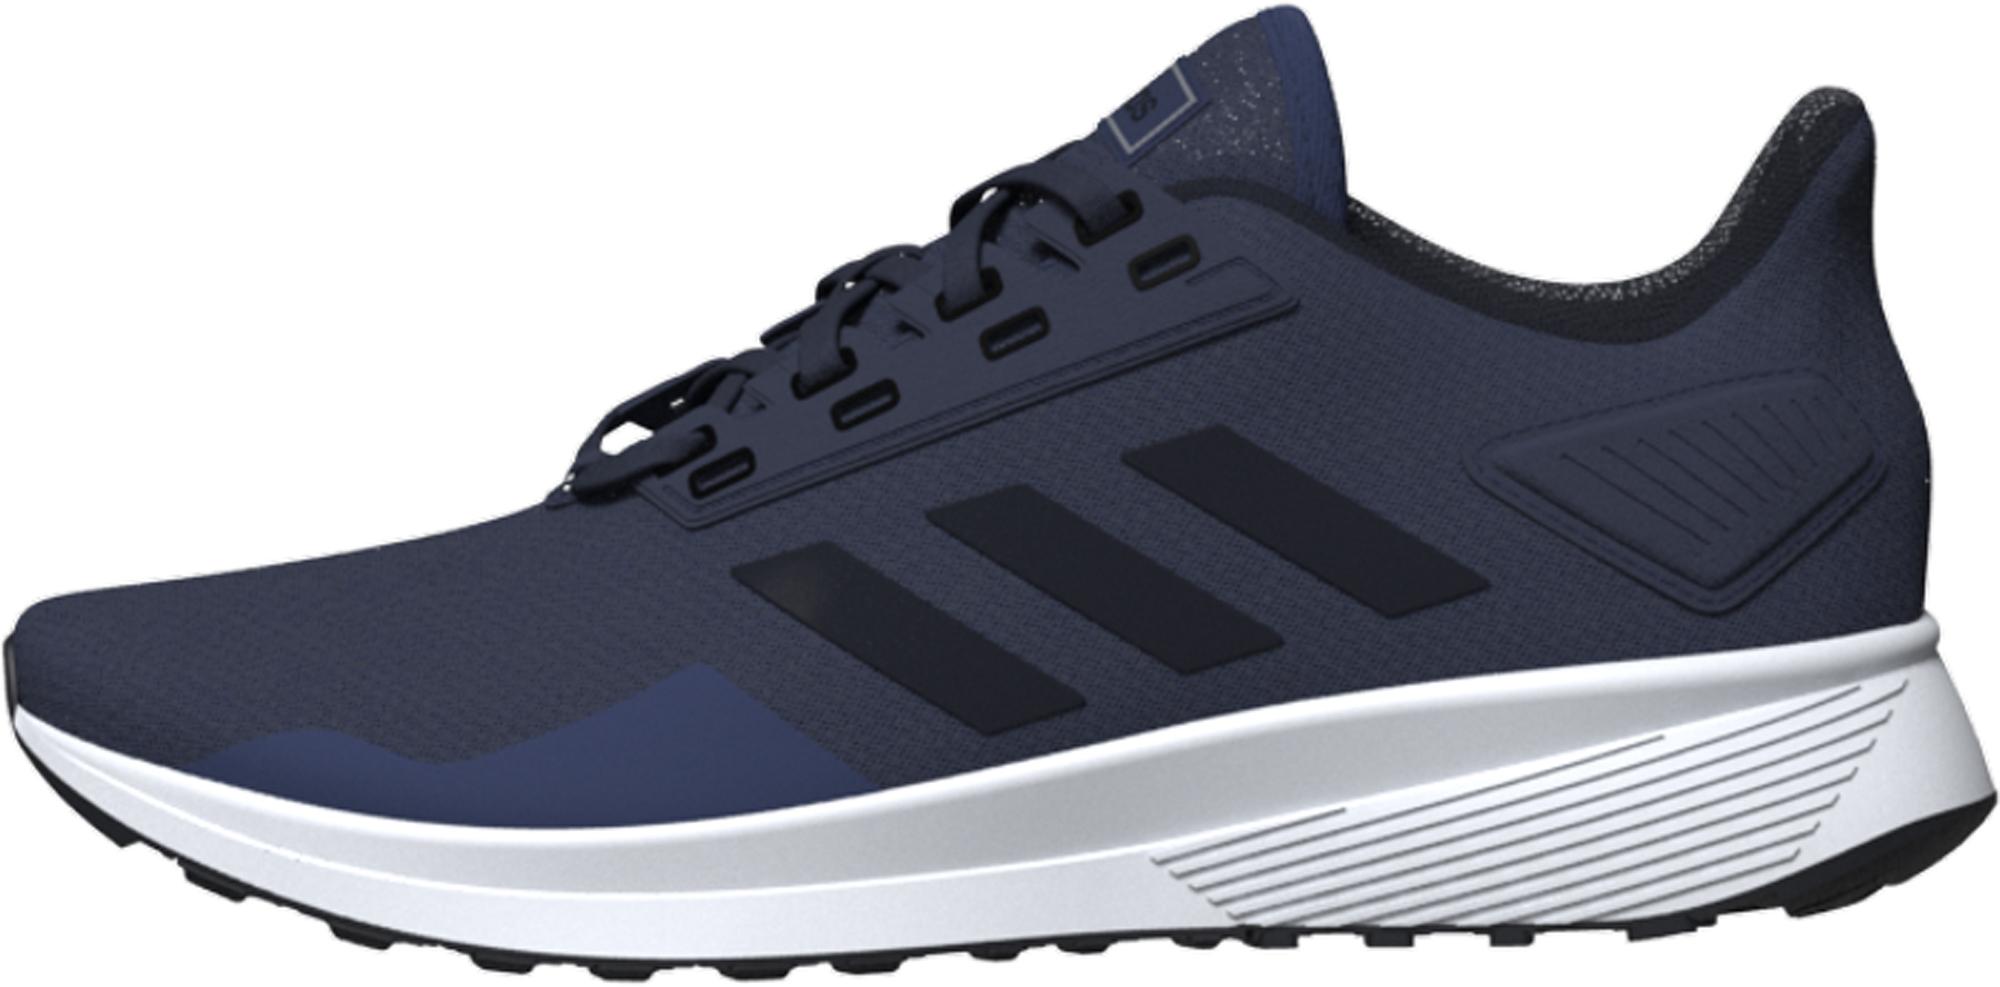 Adidas Кроссовки мужские Adidas Duramo 9, размер 42,5 цена